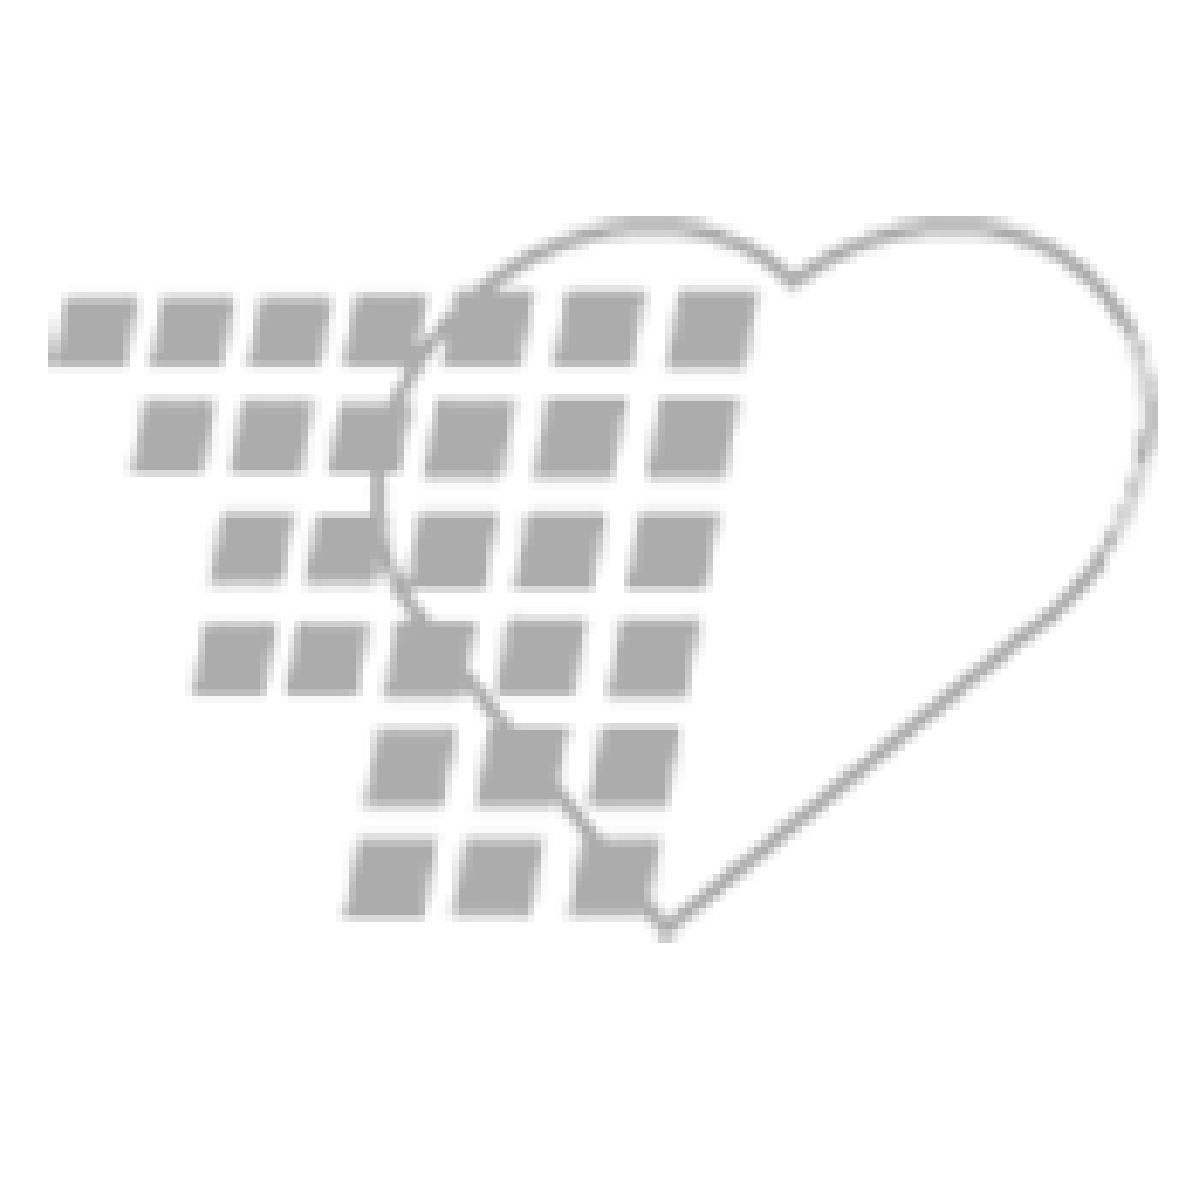 02-38-0130 - Assure® Lance Plus Safety Lancets - 30G